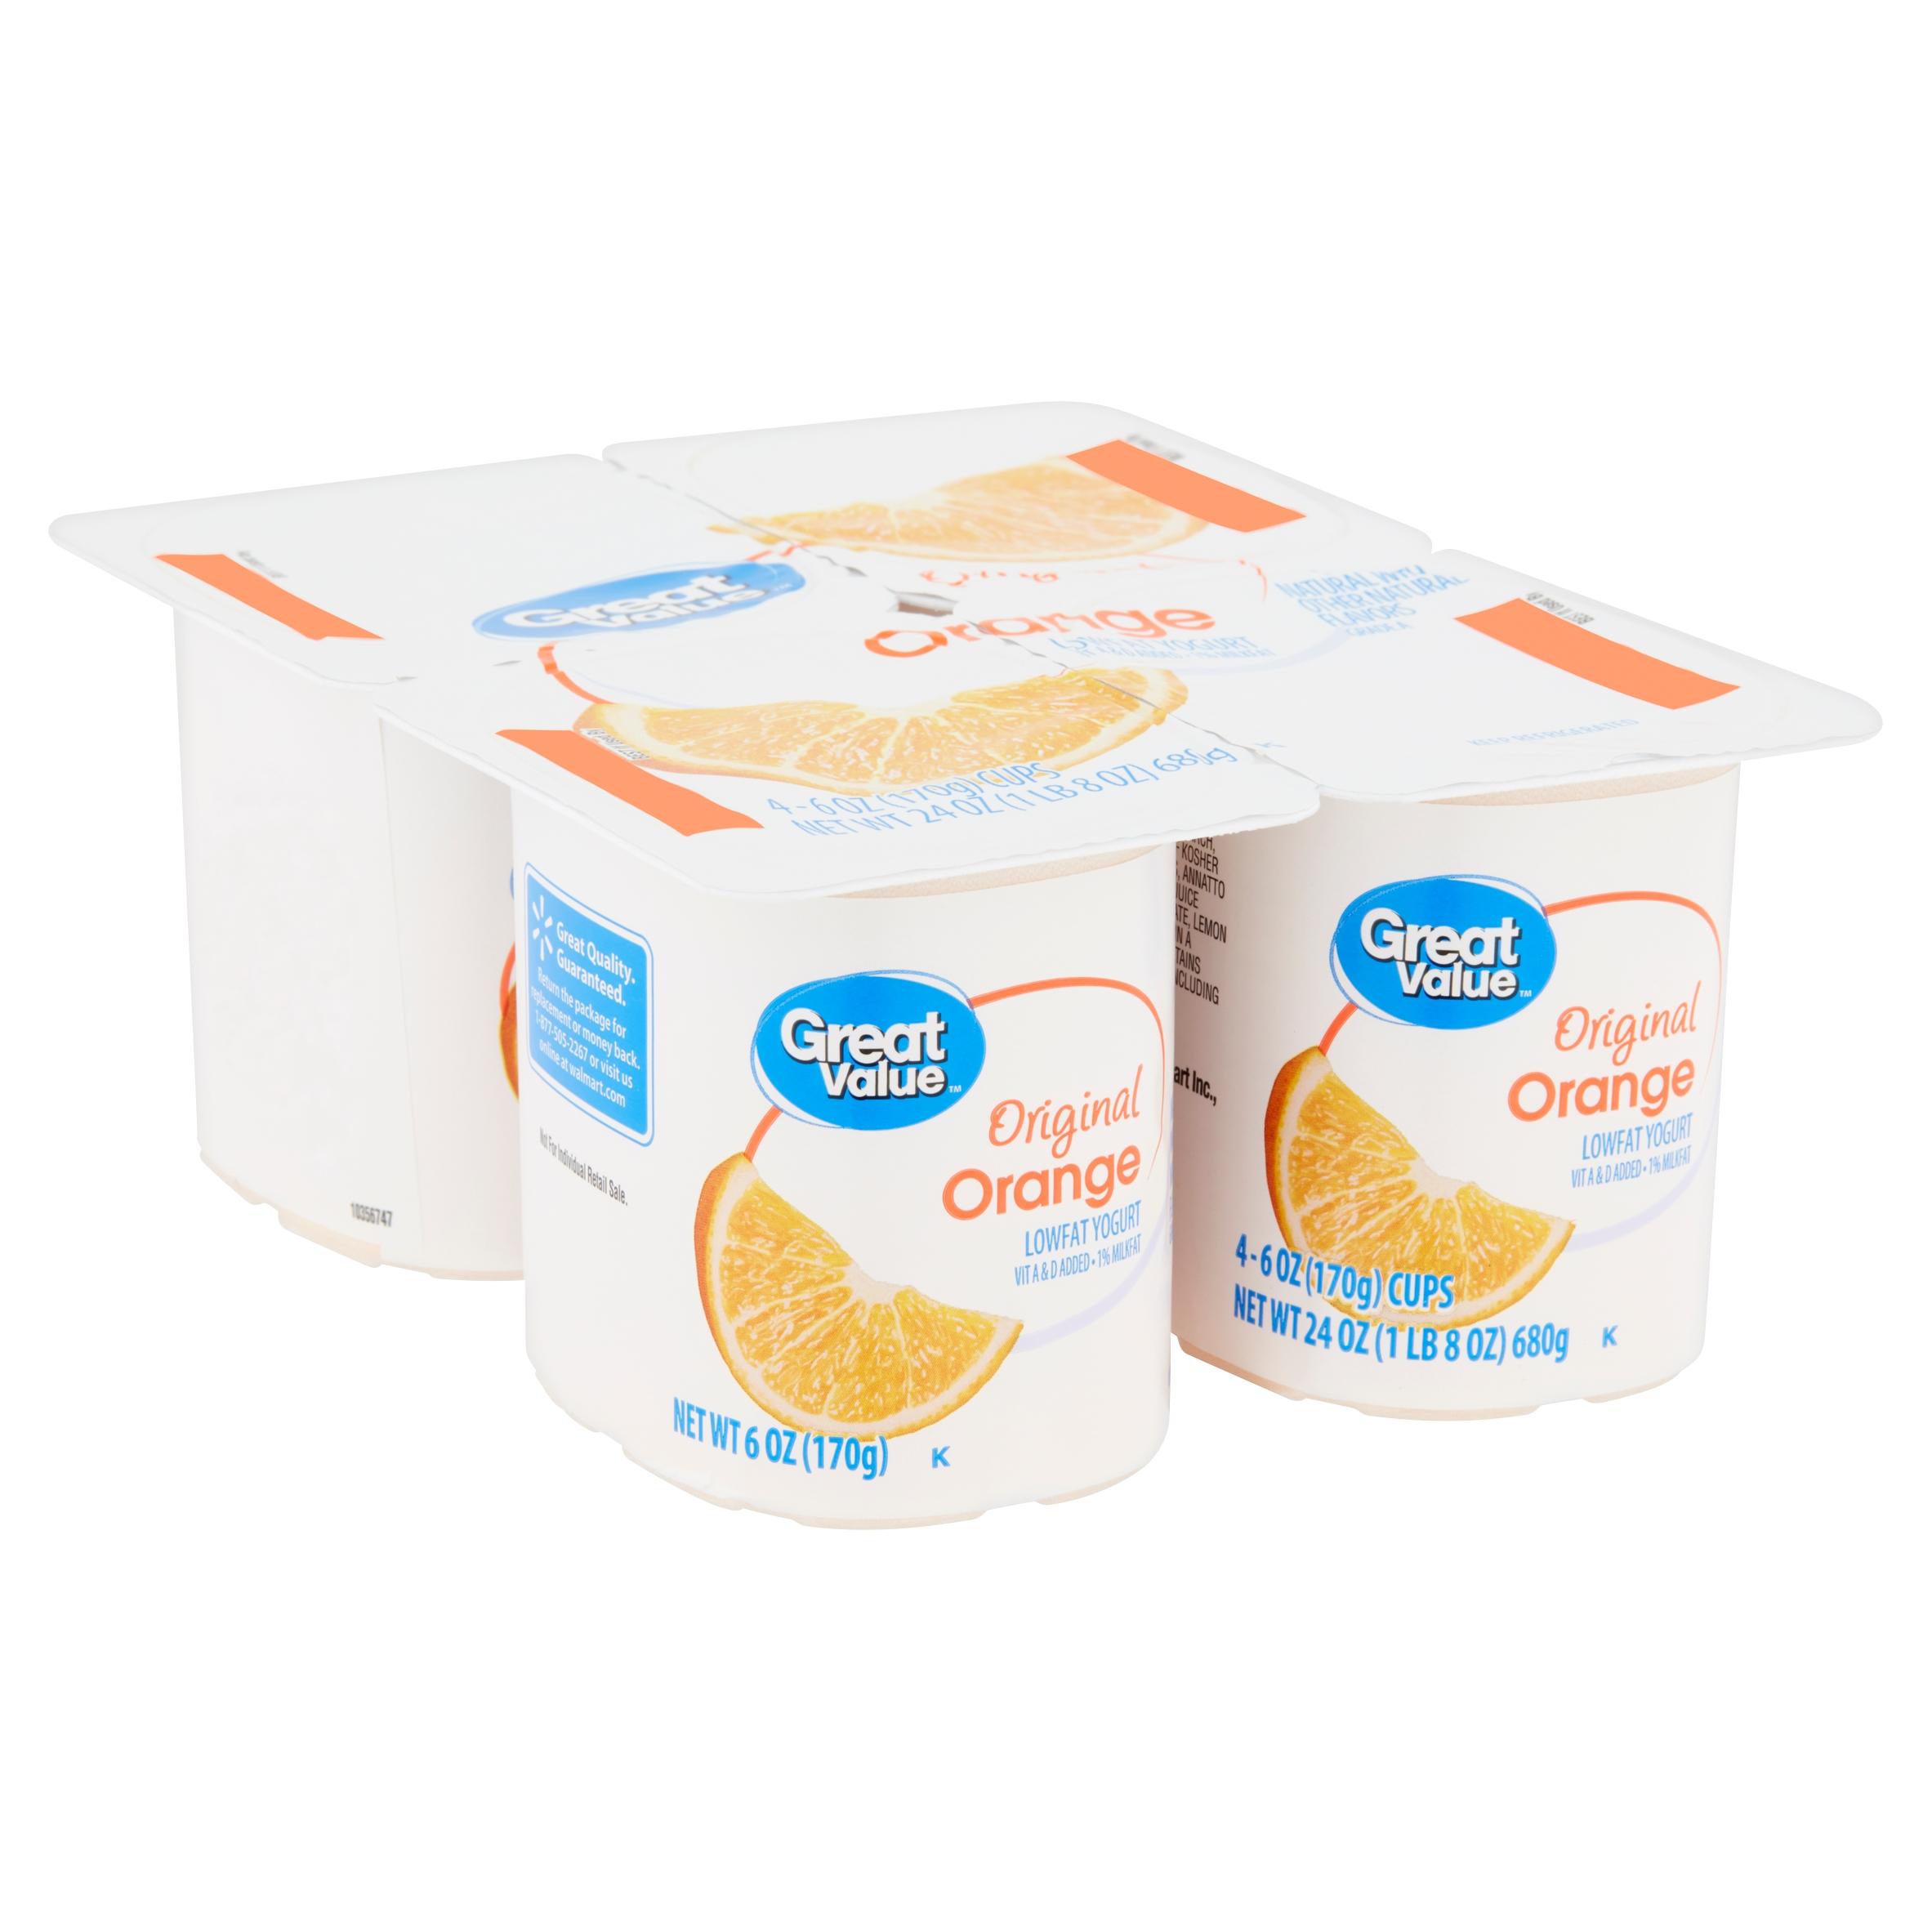 Great Value Original Orange Lowfat Yogurt, 6 oz, 4 count